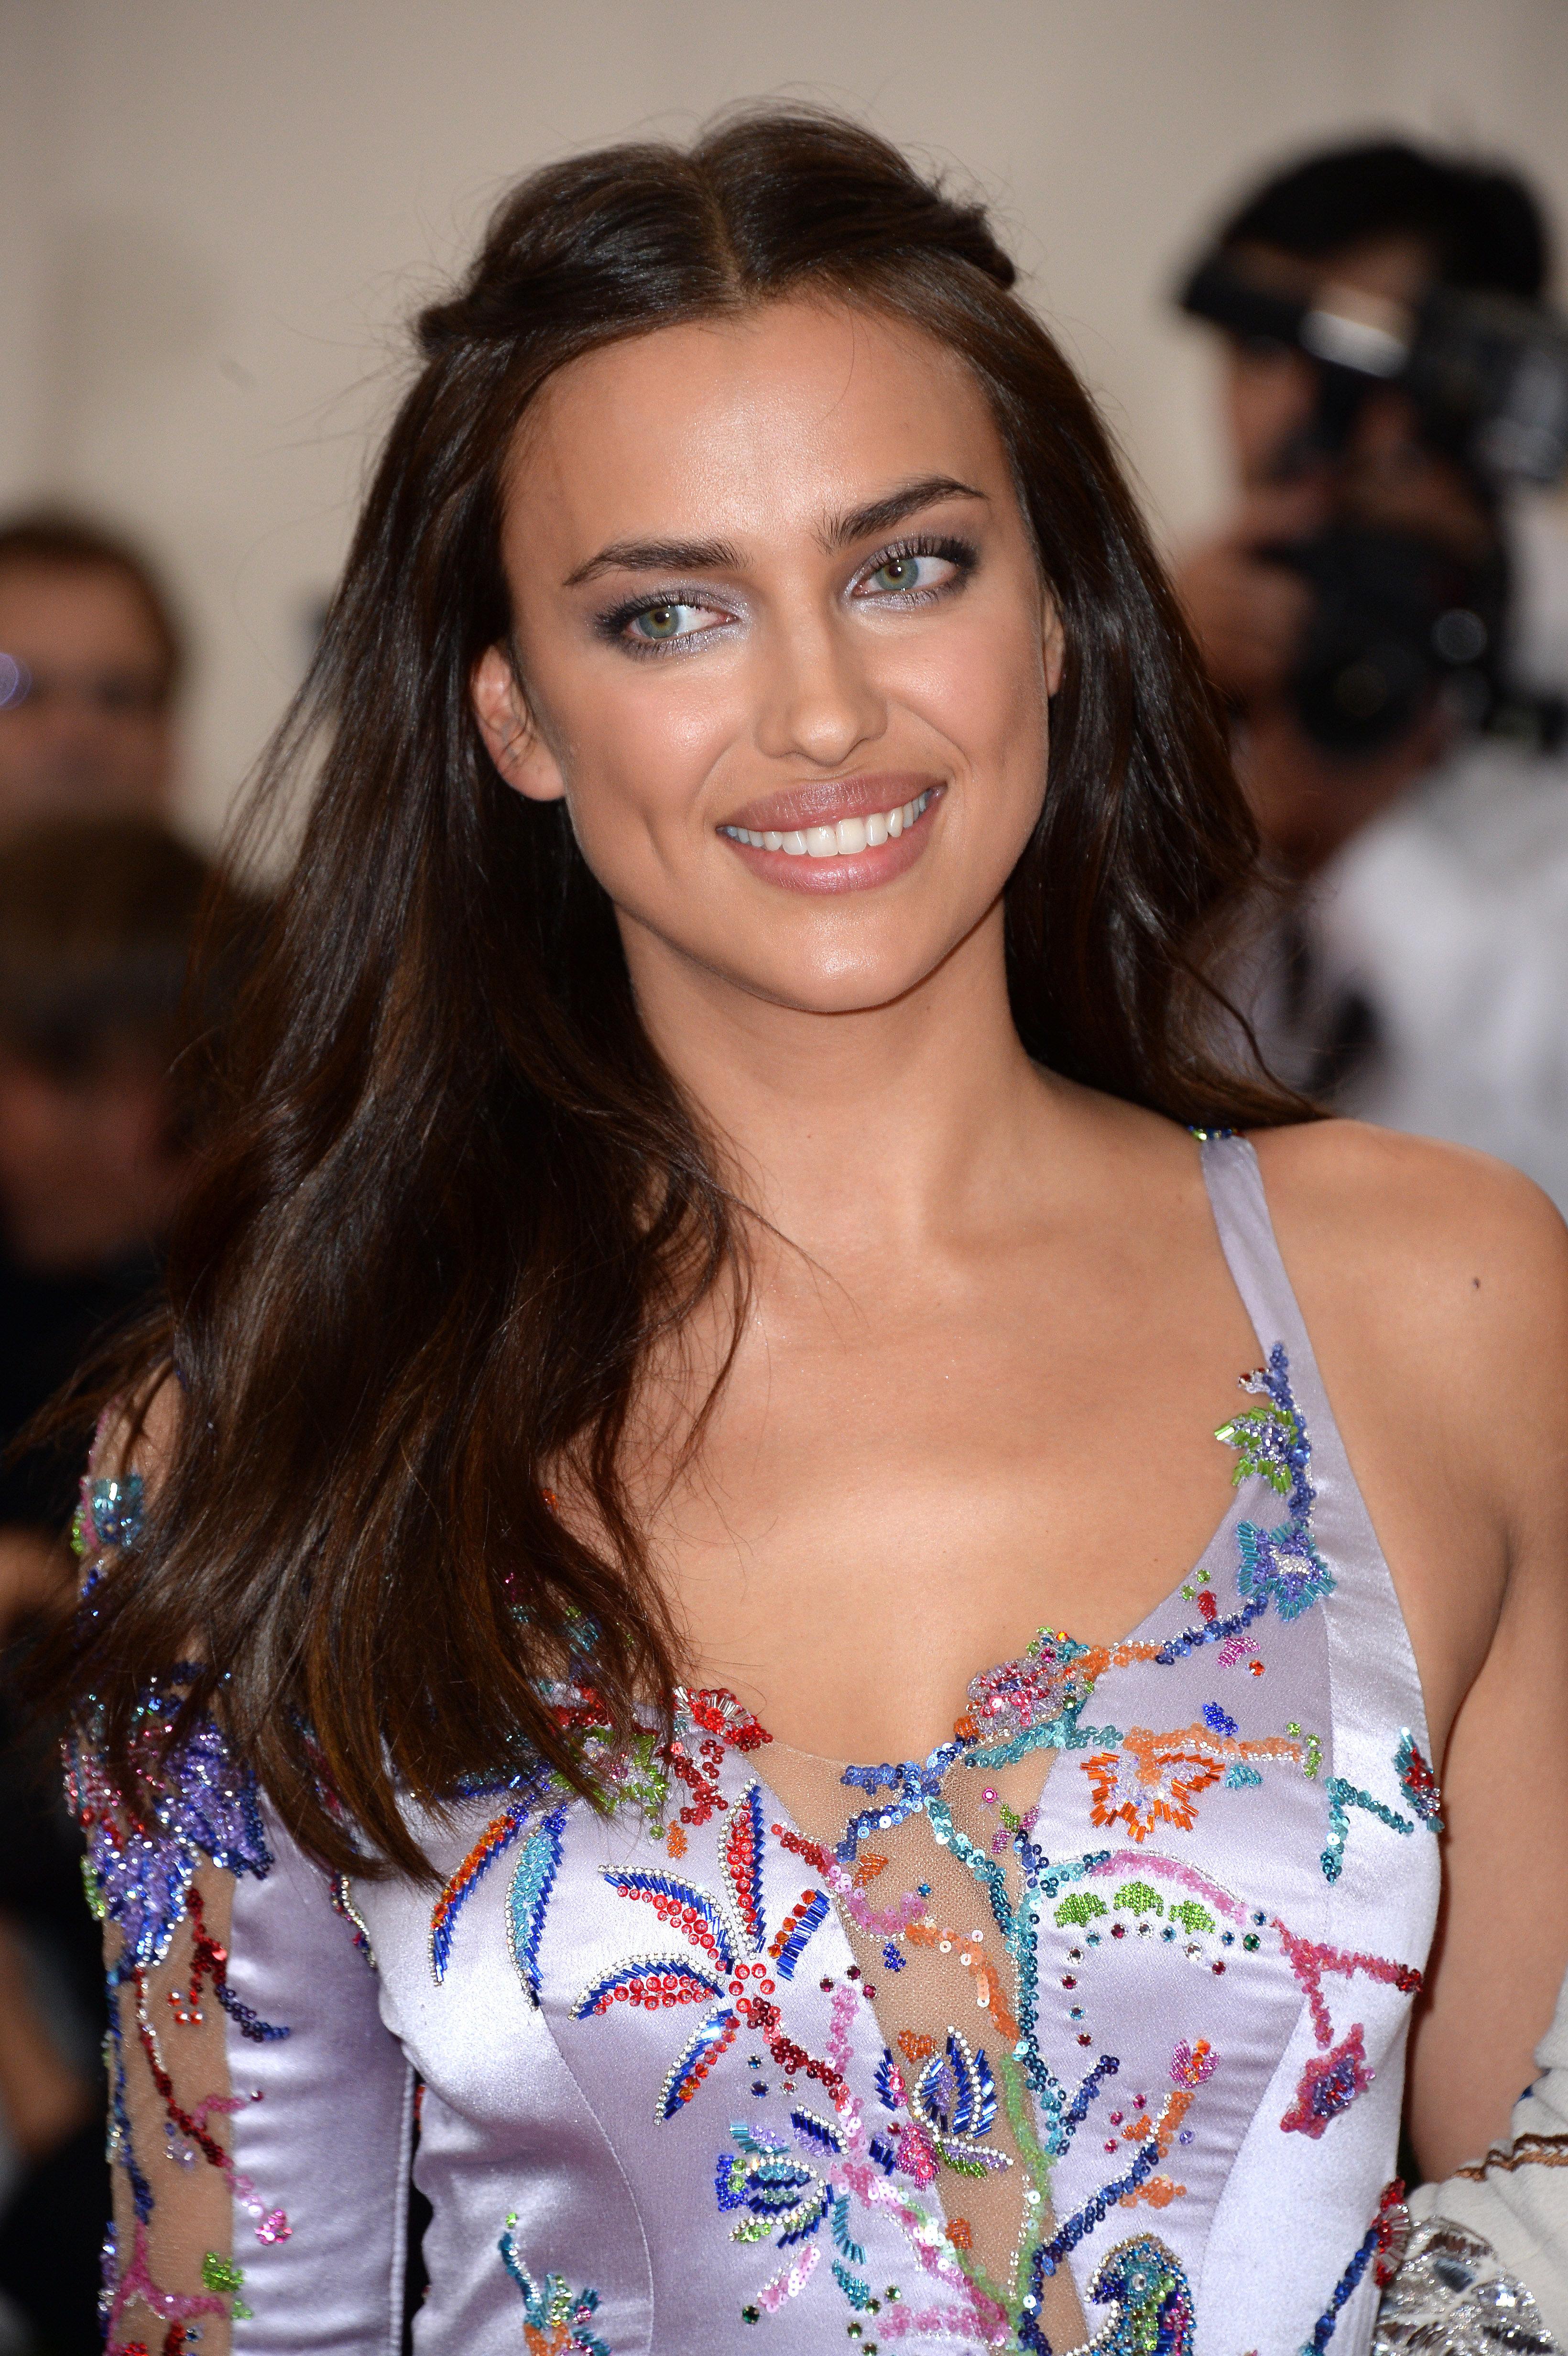 Victoria's Secret Model Irina Shayk 'Expecting First Child' With Bradley